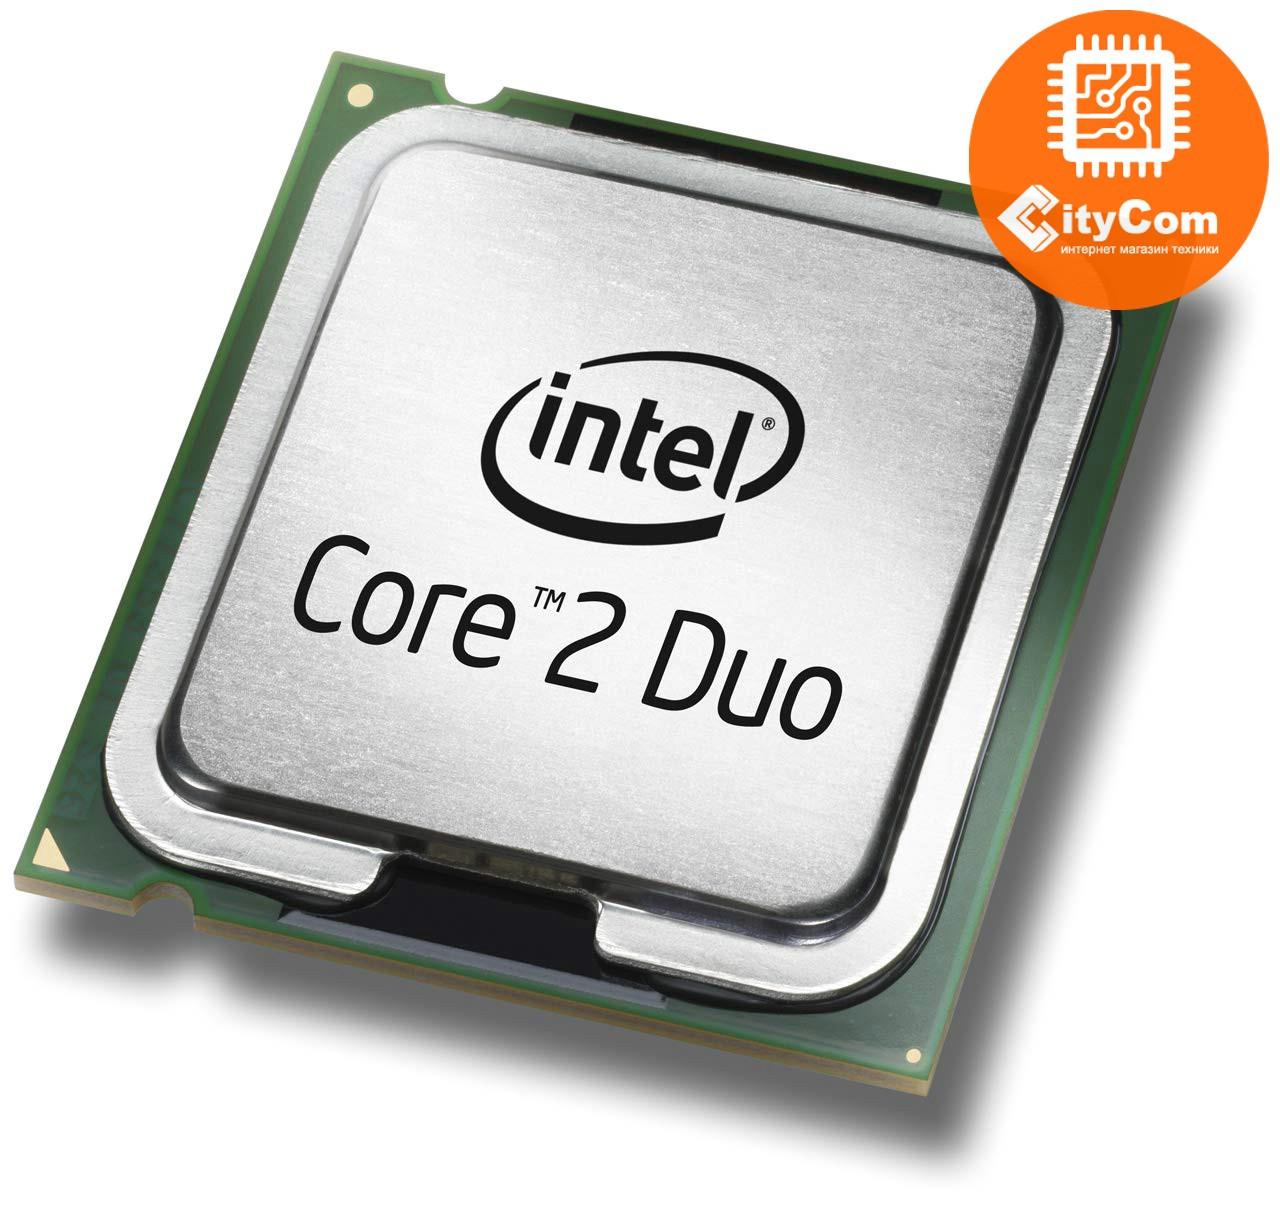 CPU S-775 Intel Core2Duo E4300 1.8 GHz (2MB, 800 MHz, LGA775) oem Арт.1362